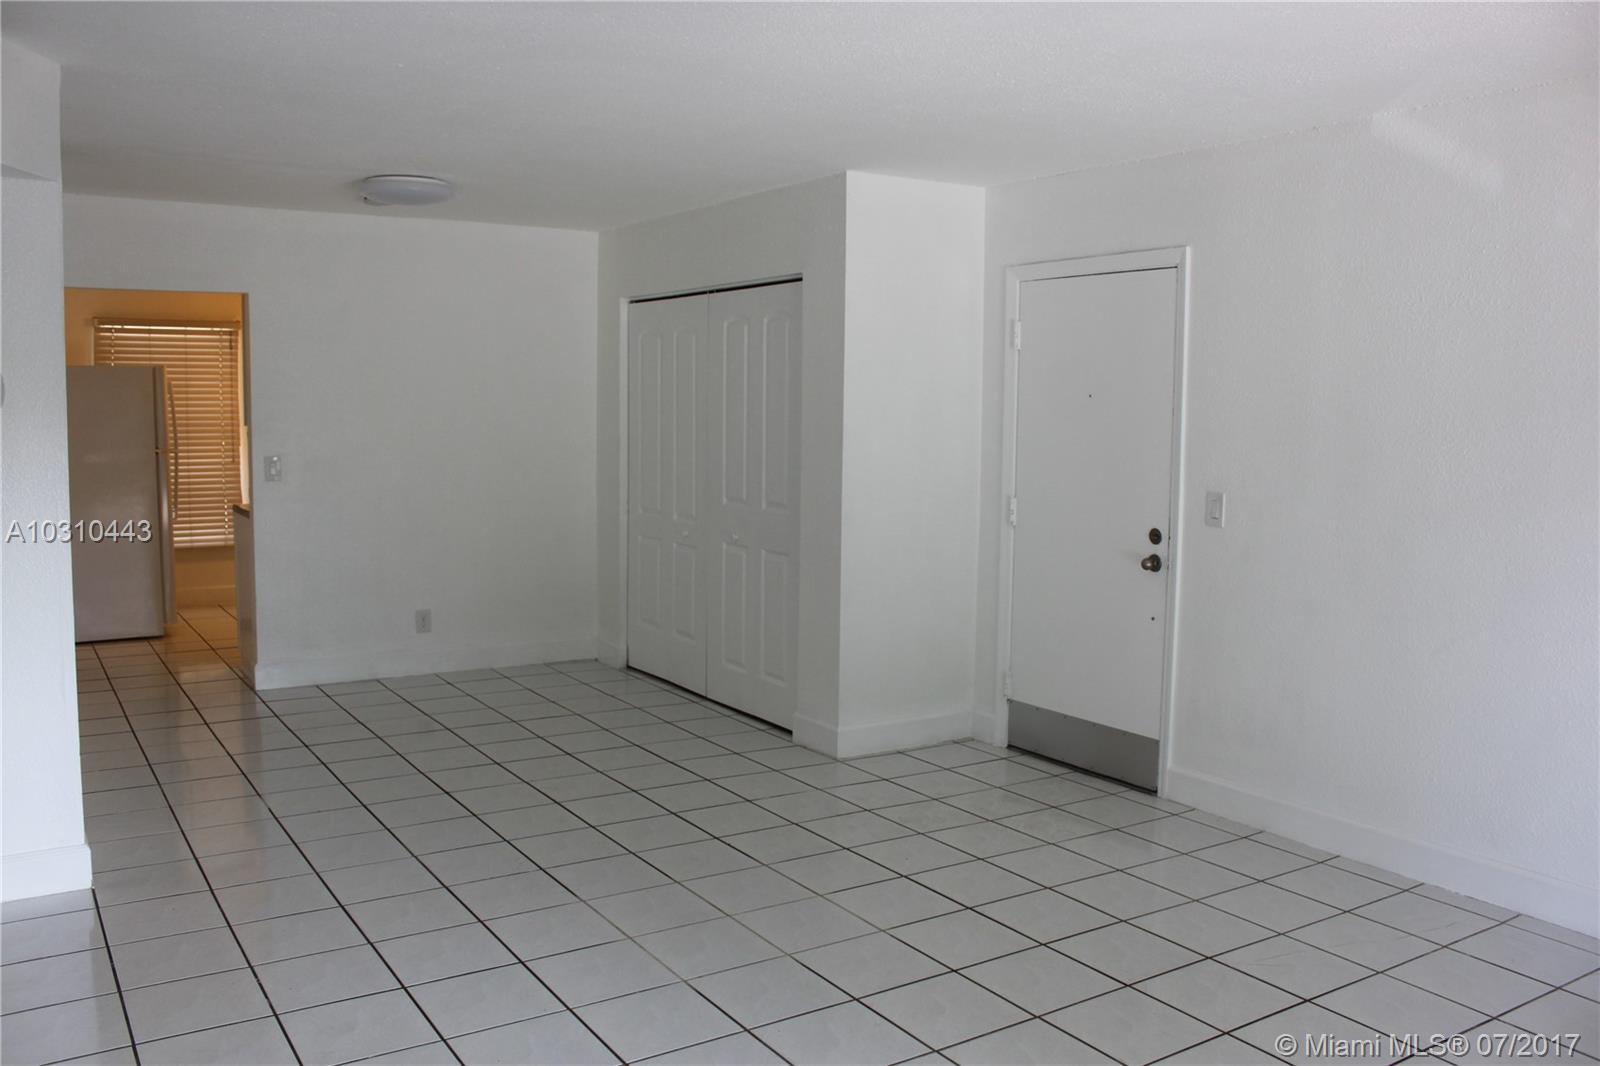 1500 N Congress Ave # C25, West Palm Beach, FL 33401